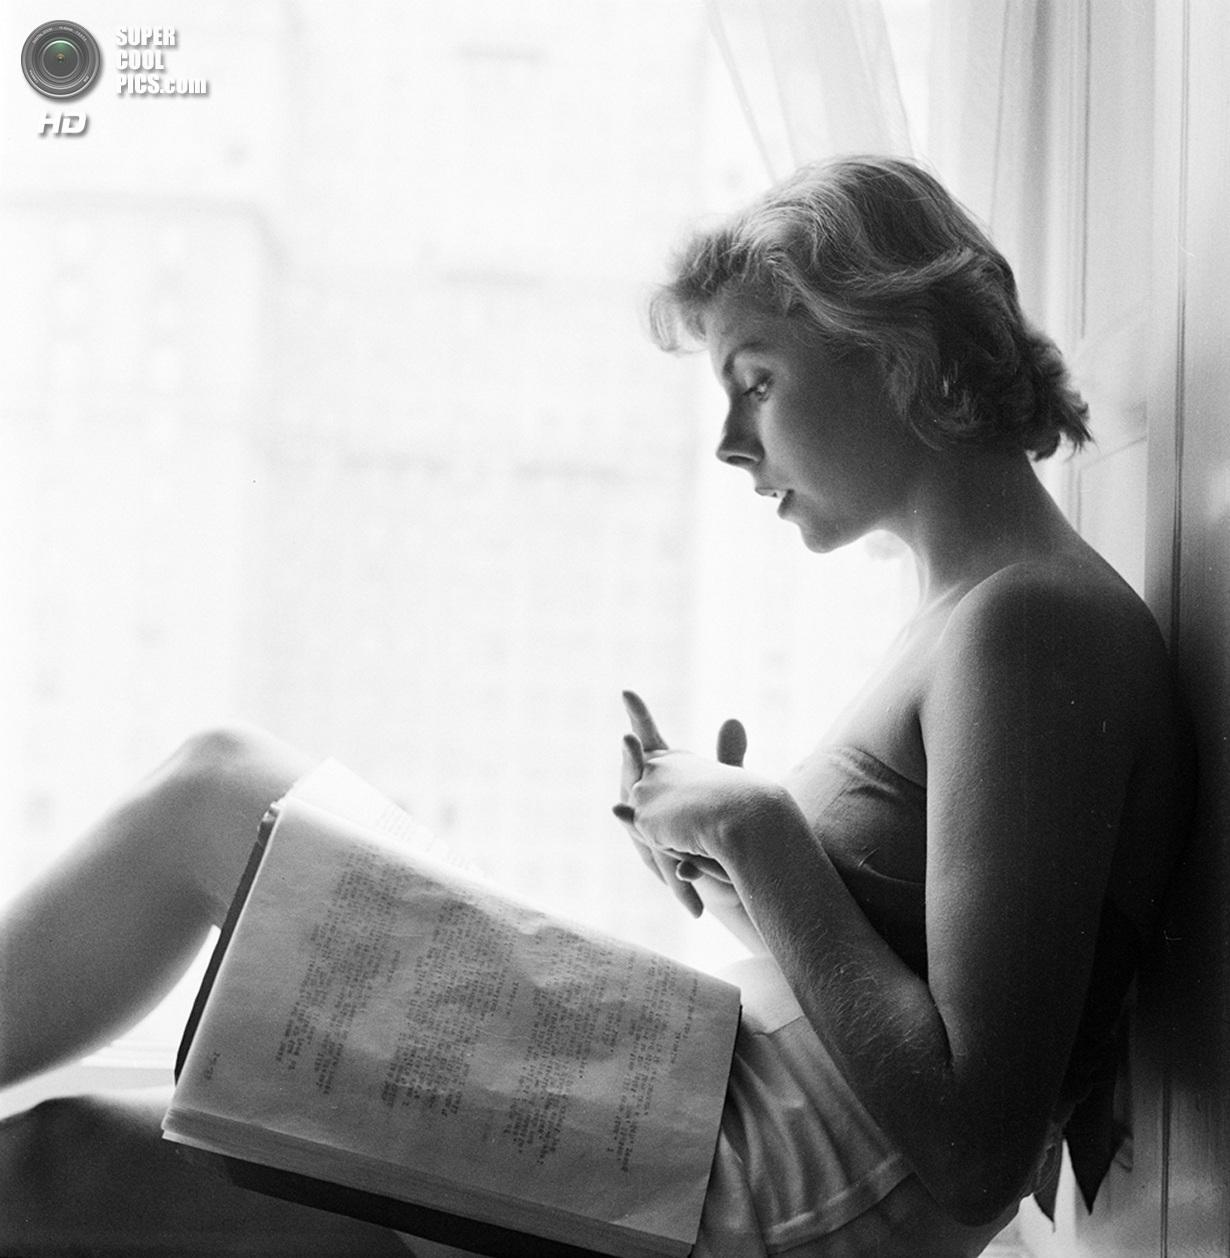 США. Нью-Йорк. 1950 год. Актриса Бетси фон Фюрстенберг. (V&M/Look/Stanley Kubrick)